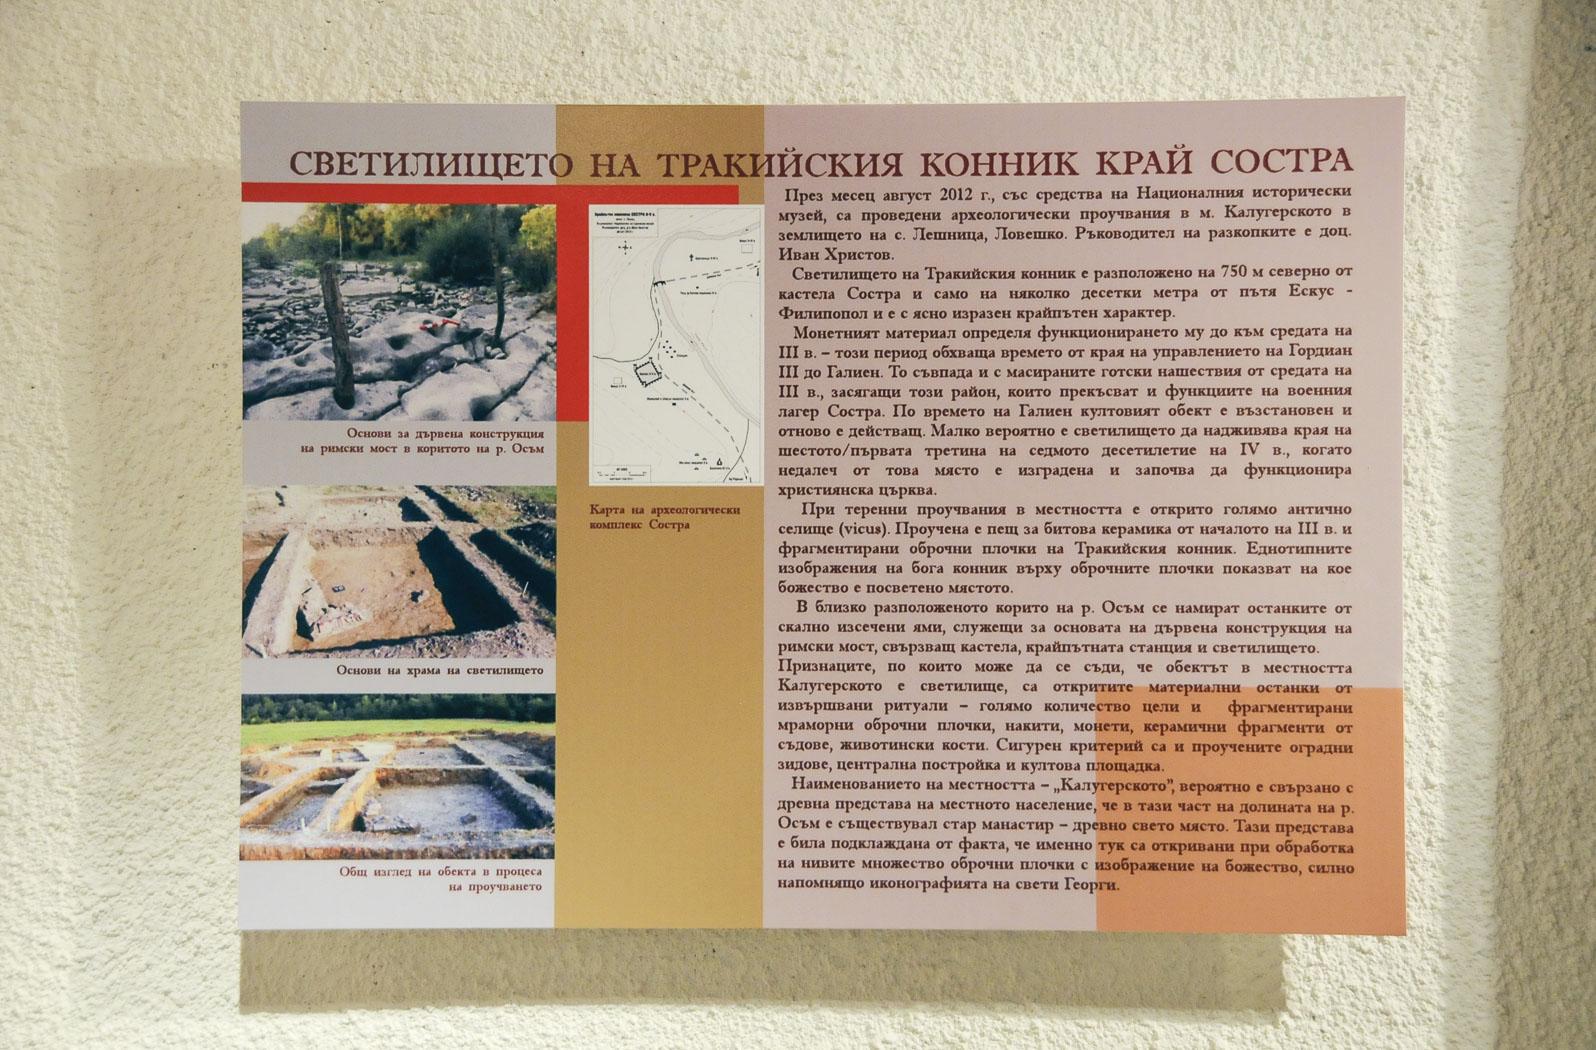 troyan-museum-jivotat-na-edna-idea-26